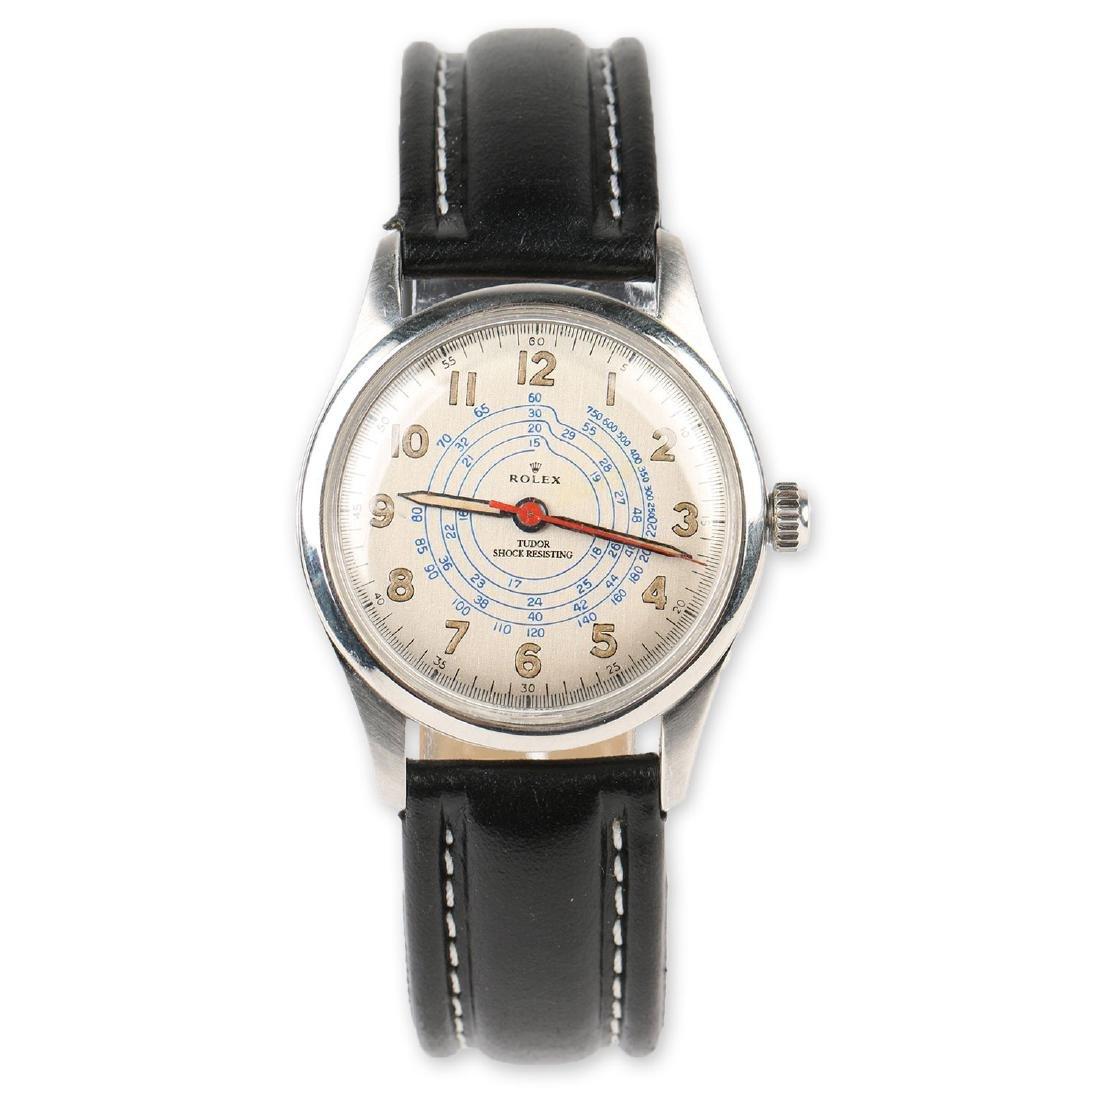 "Rolex Tudor ""Shock-Resisting"" Wristwatch"